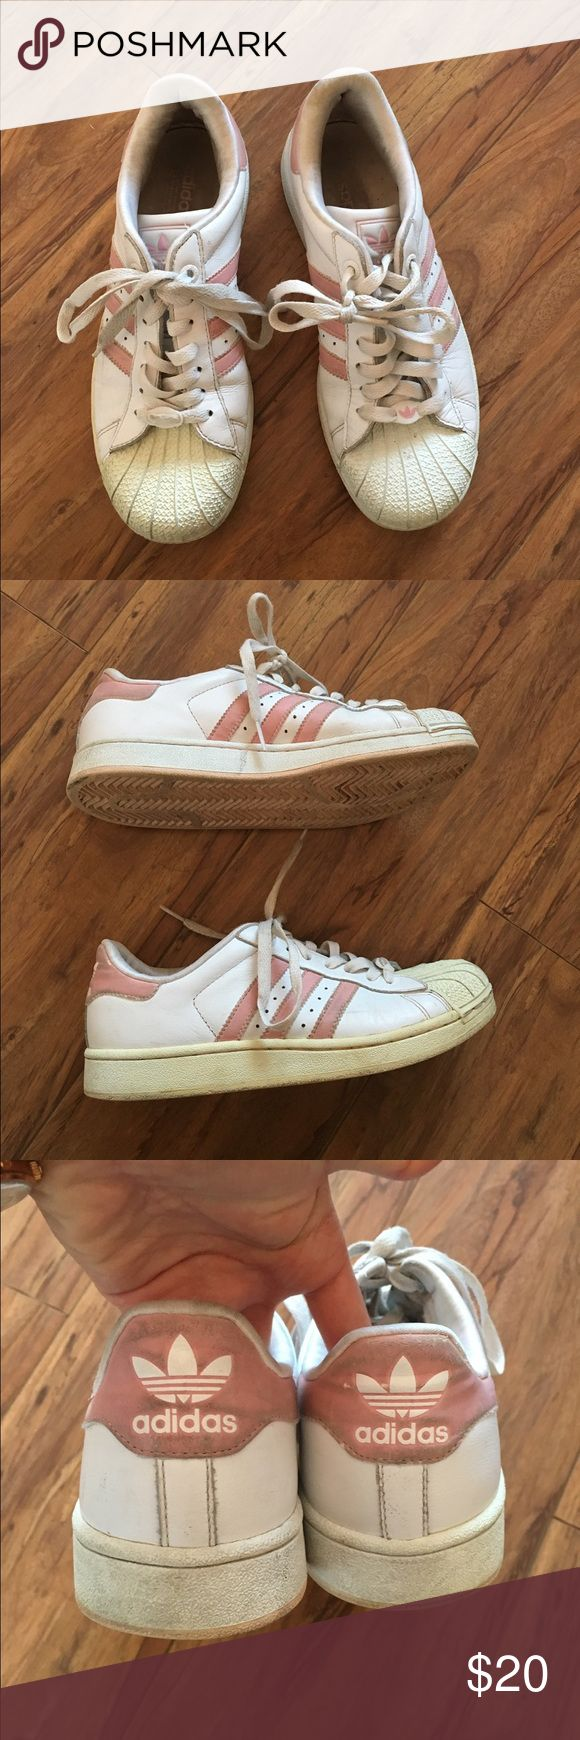 Pink Adidas Superstar Sneakers